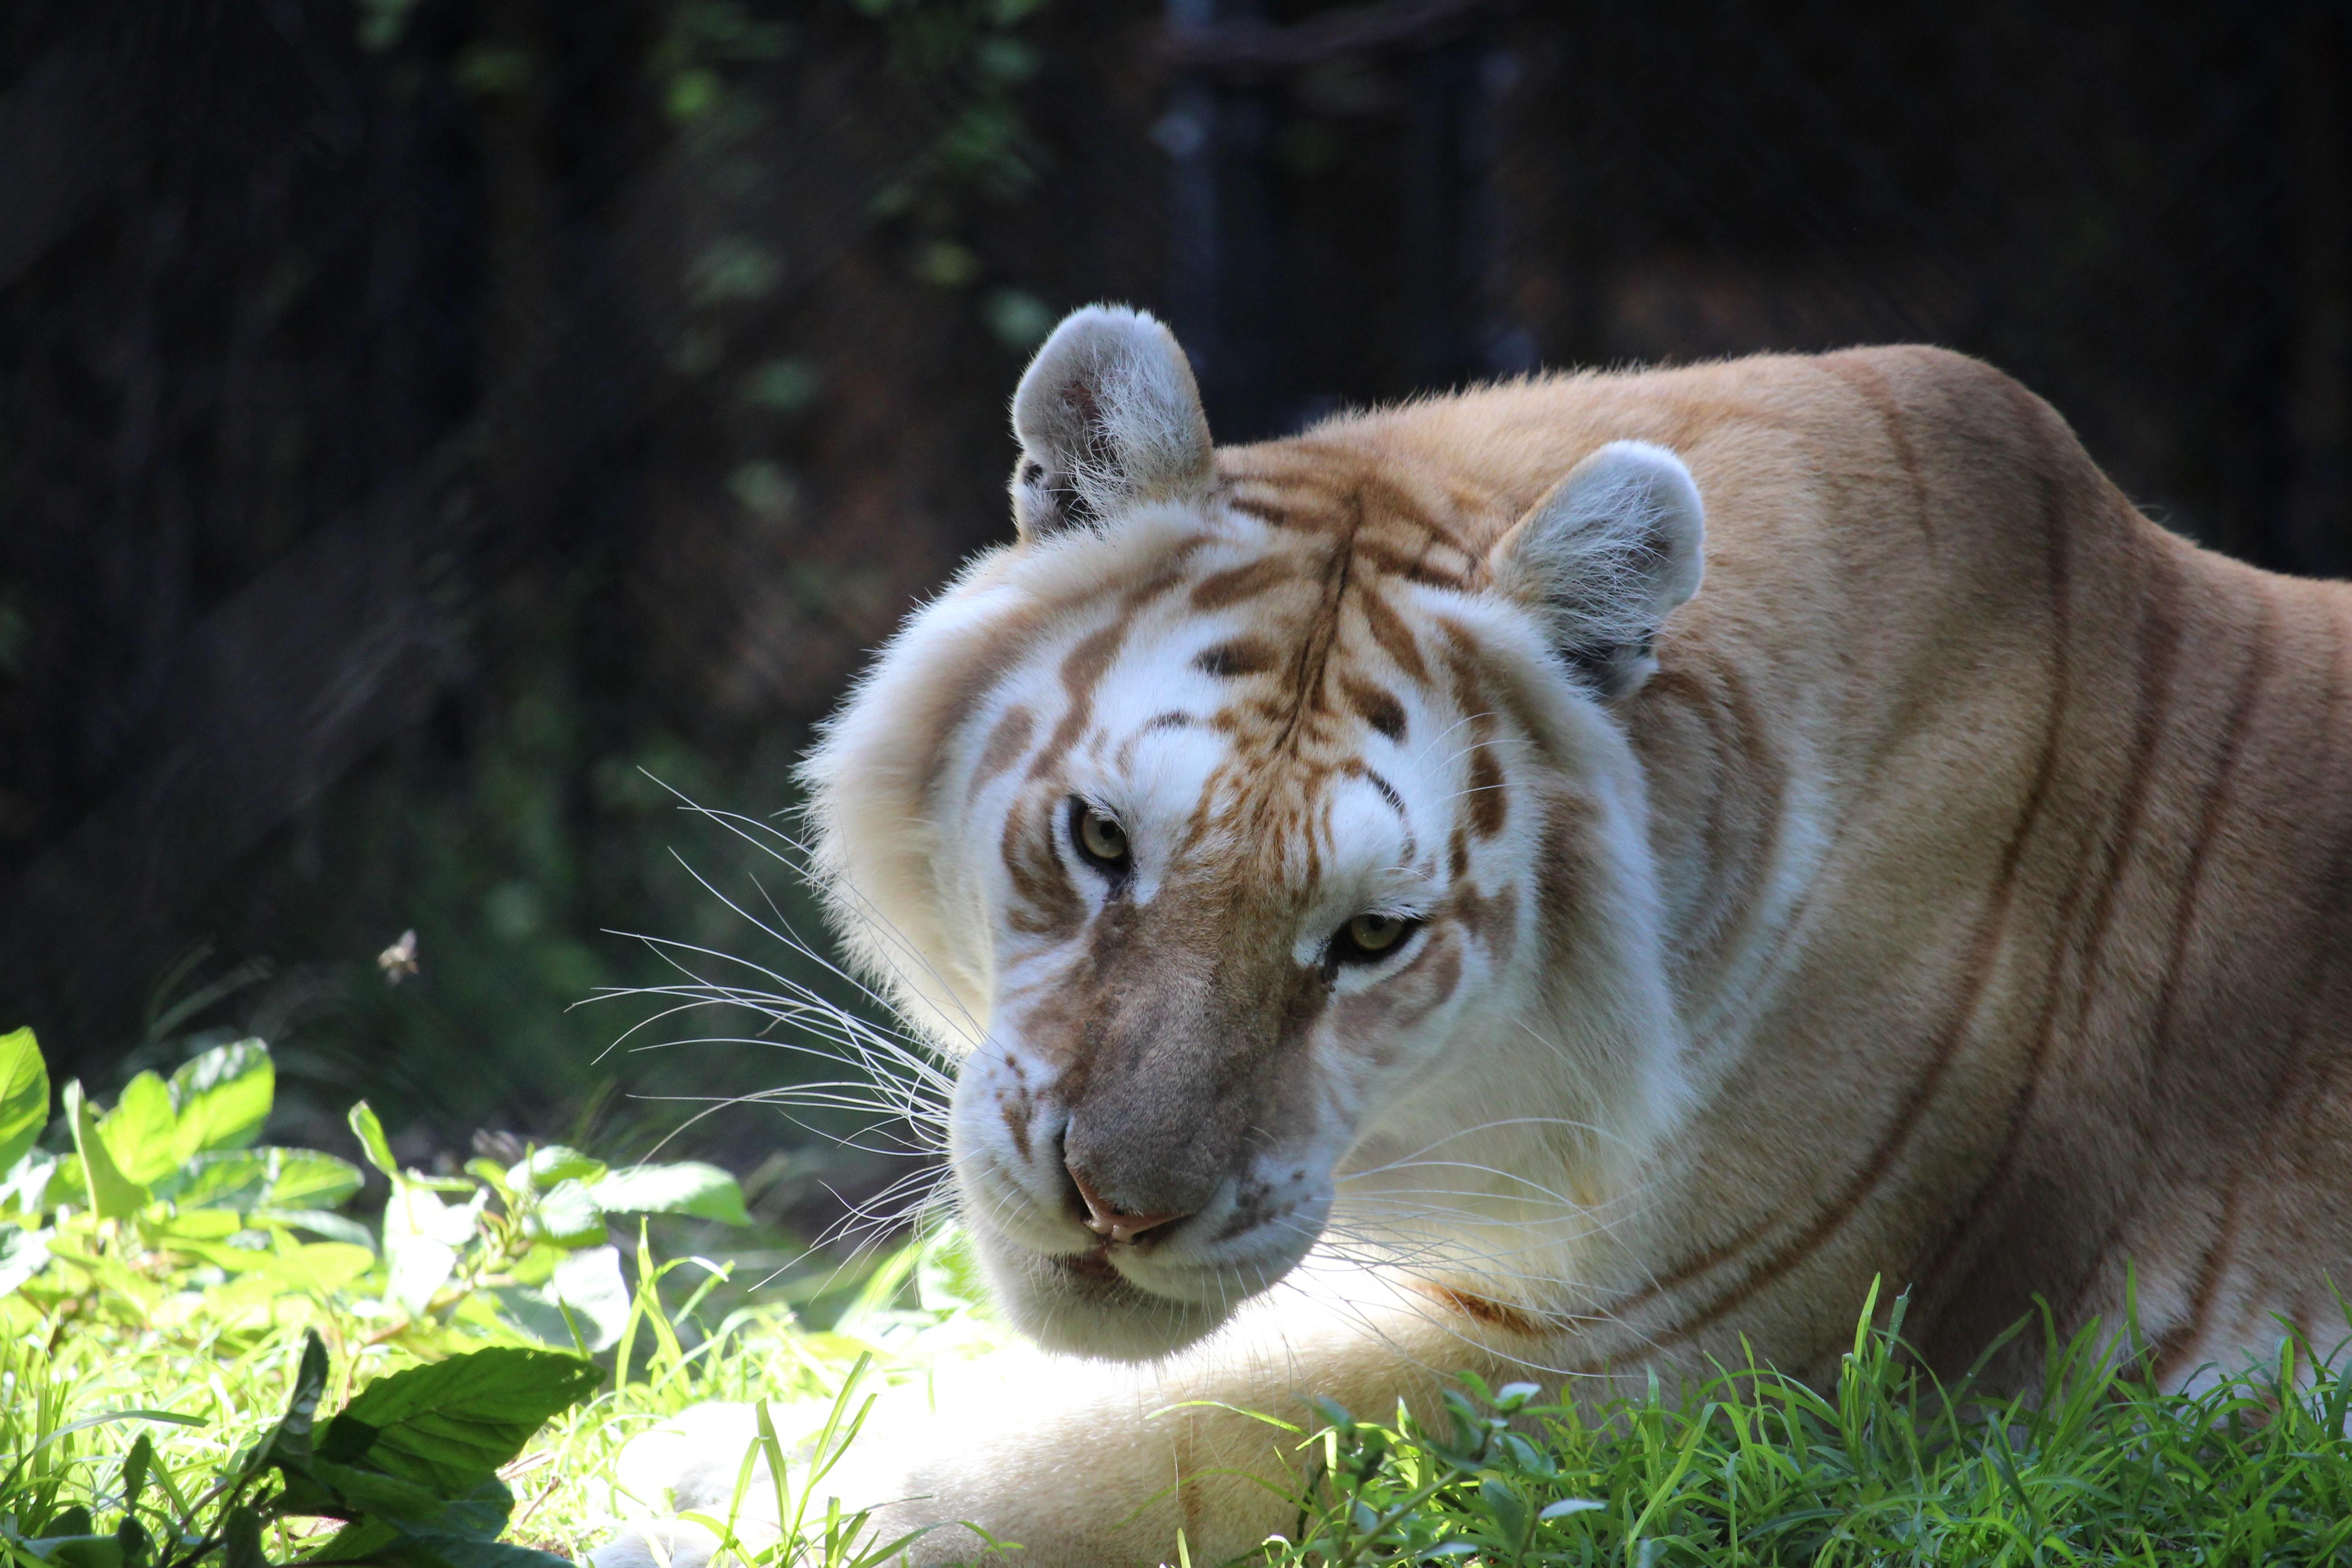 Gambar Margasatwa Kebun Binatang Binatang Menyusui Fauna Singa